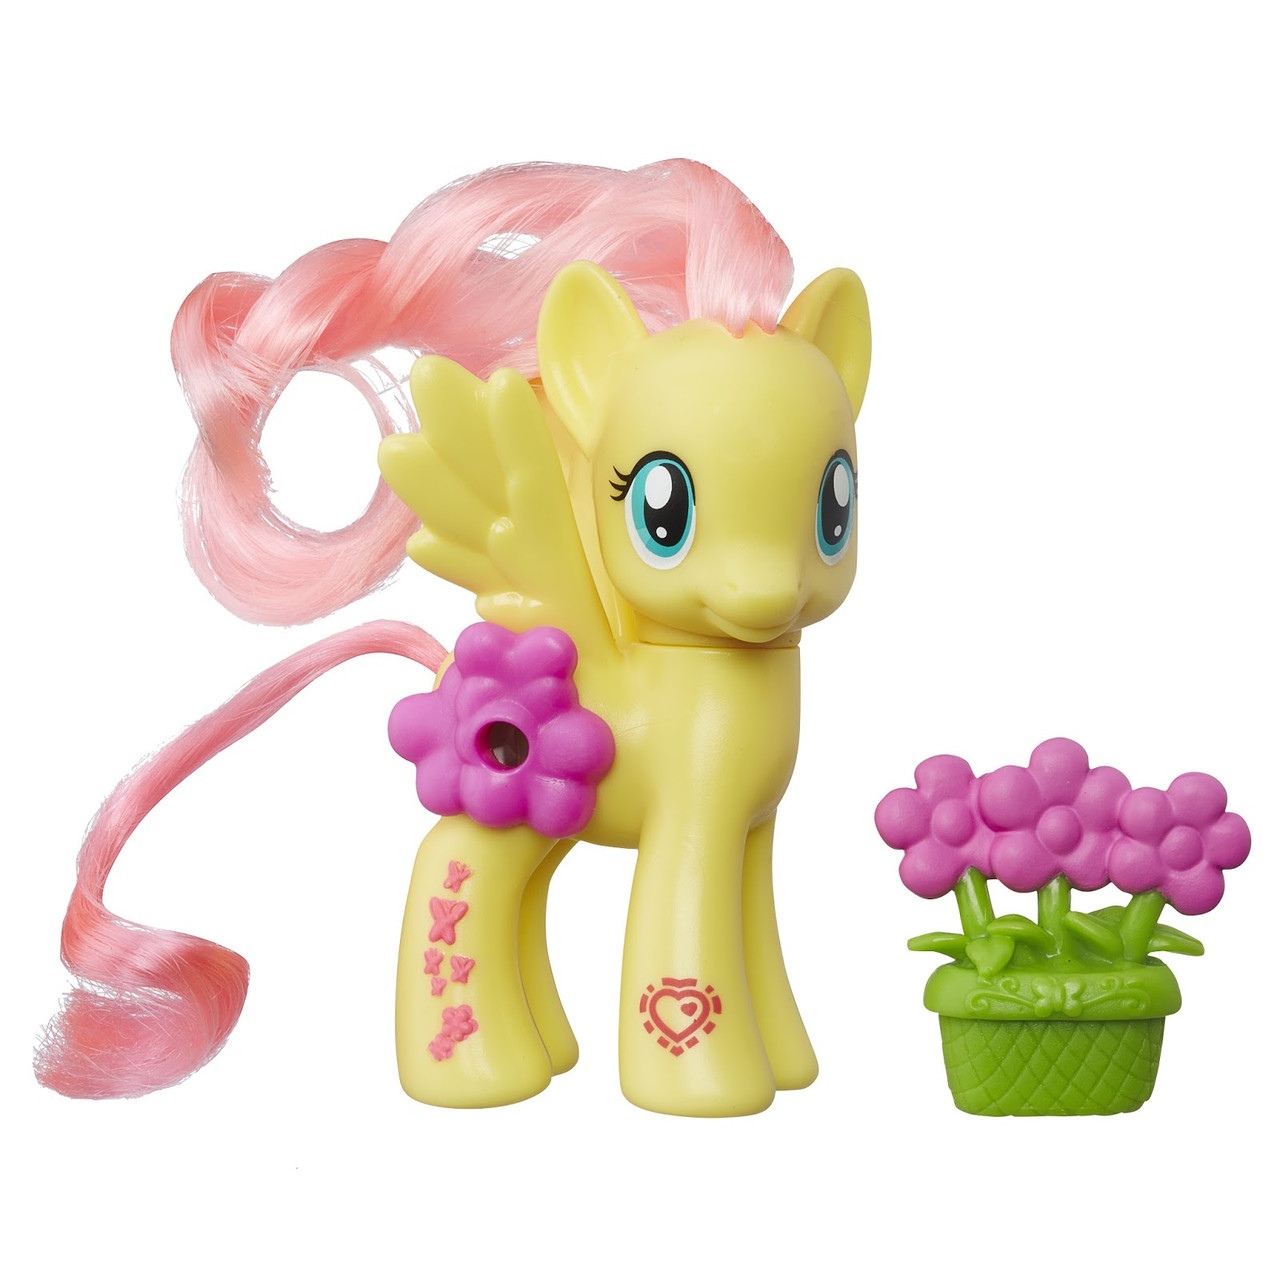 My little pony Explore Equestria Magical Scenes Fluttershy (Май Литл Пони с волшебными картинками Флаттершай )